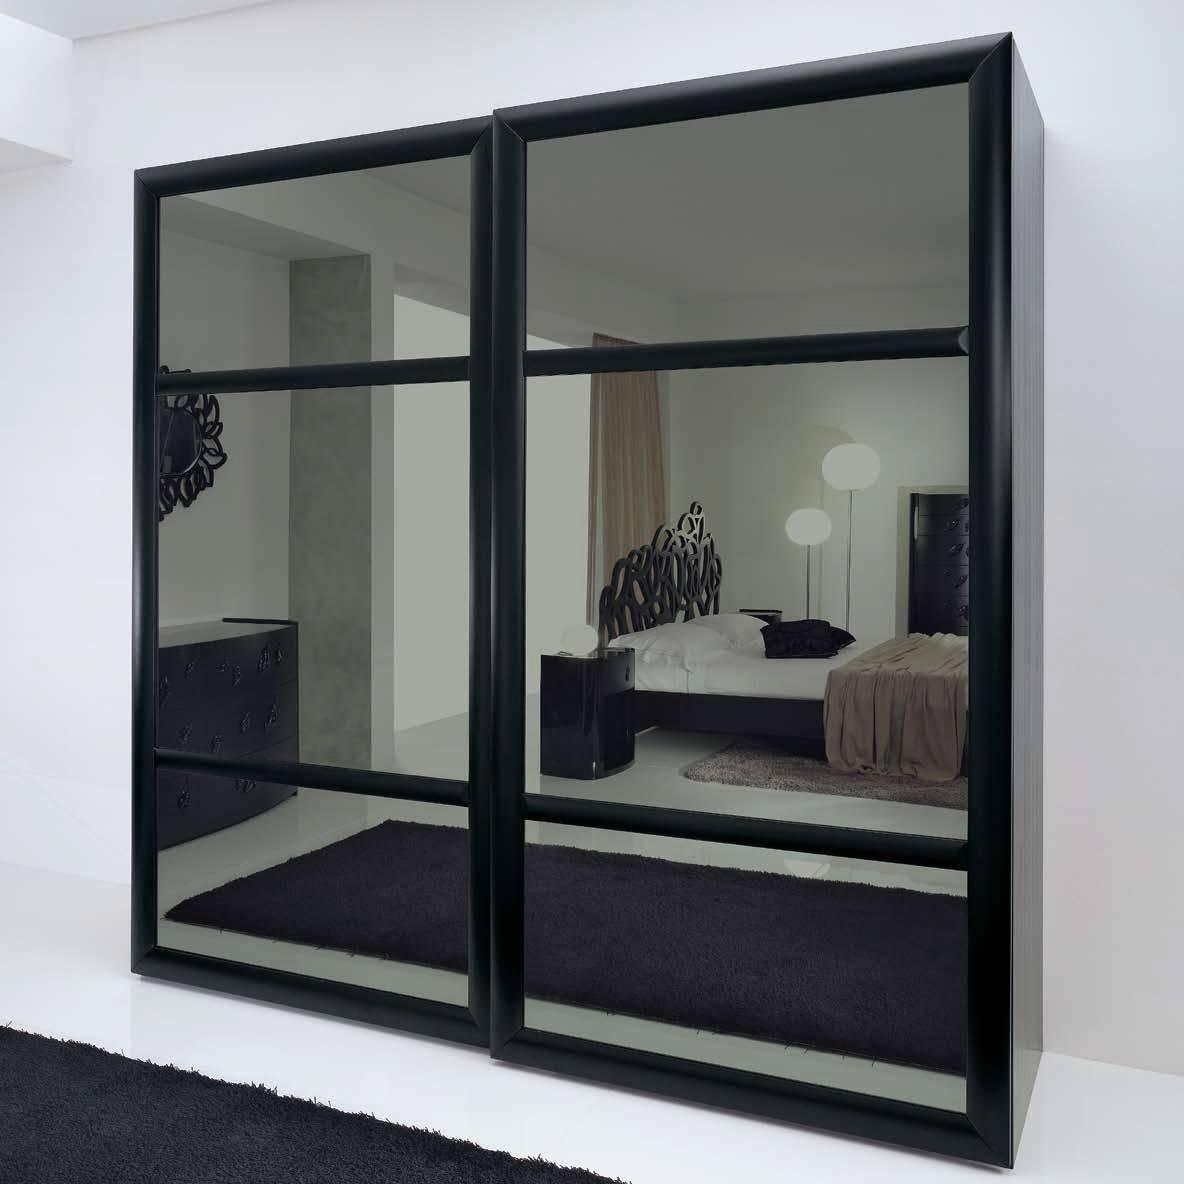 Mirrored Sliding Closet Doors. Sliding Door Great Sliding Glass inside Dark Wood Wardrobe Doors (Image 19 of 30)